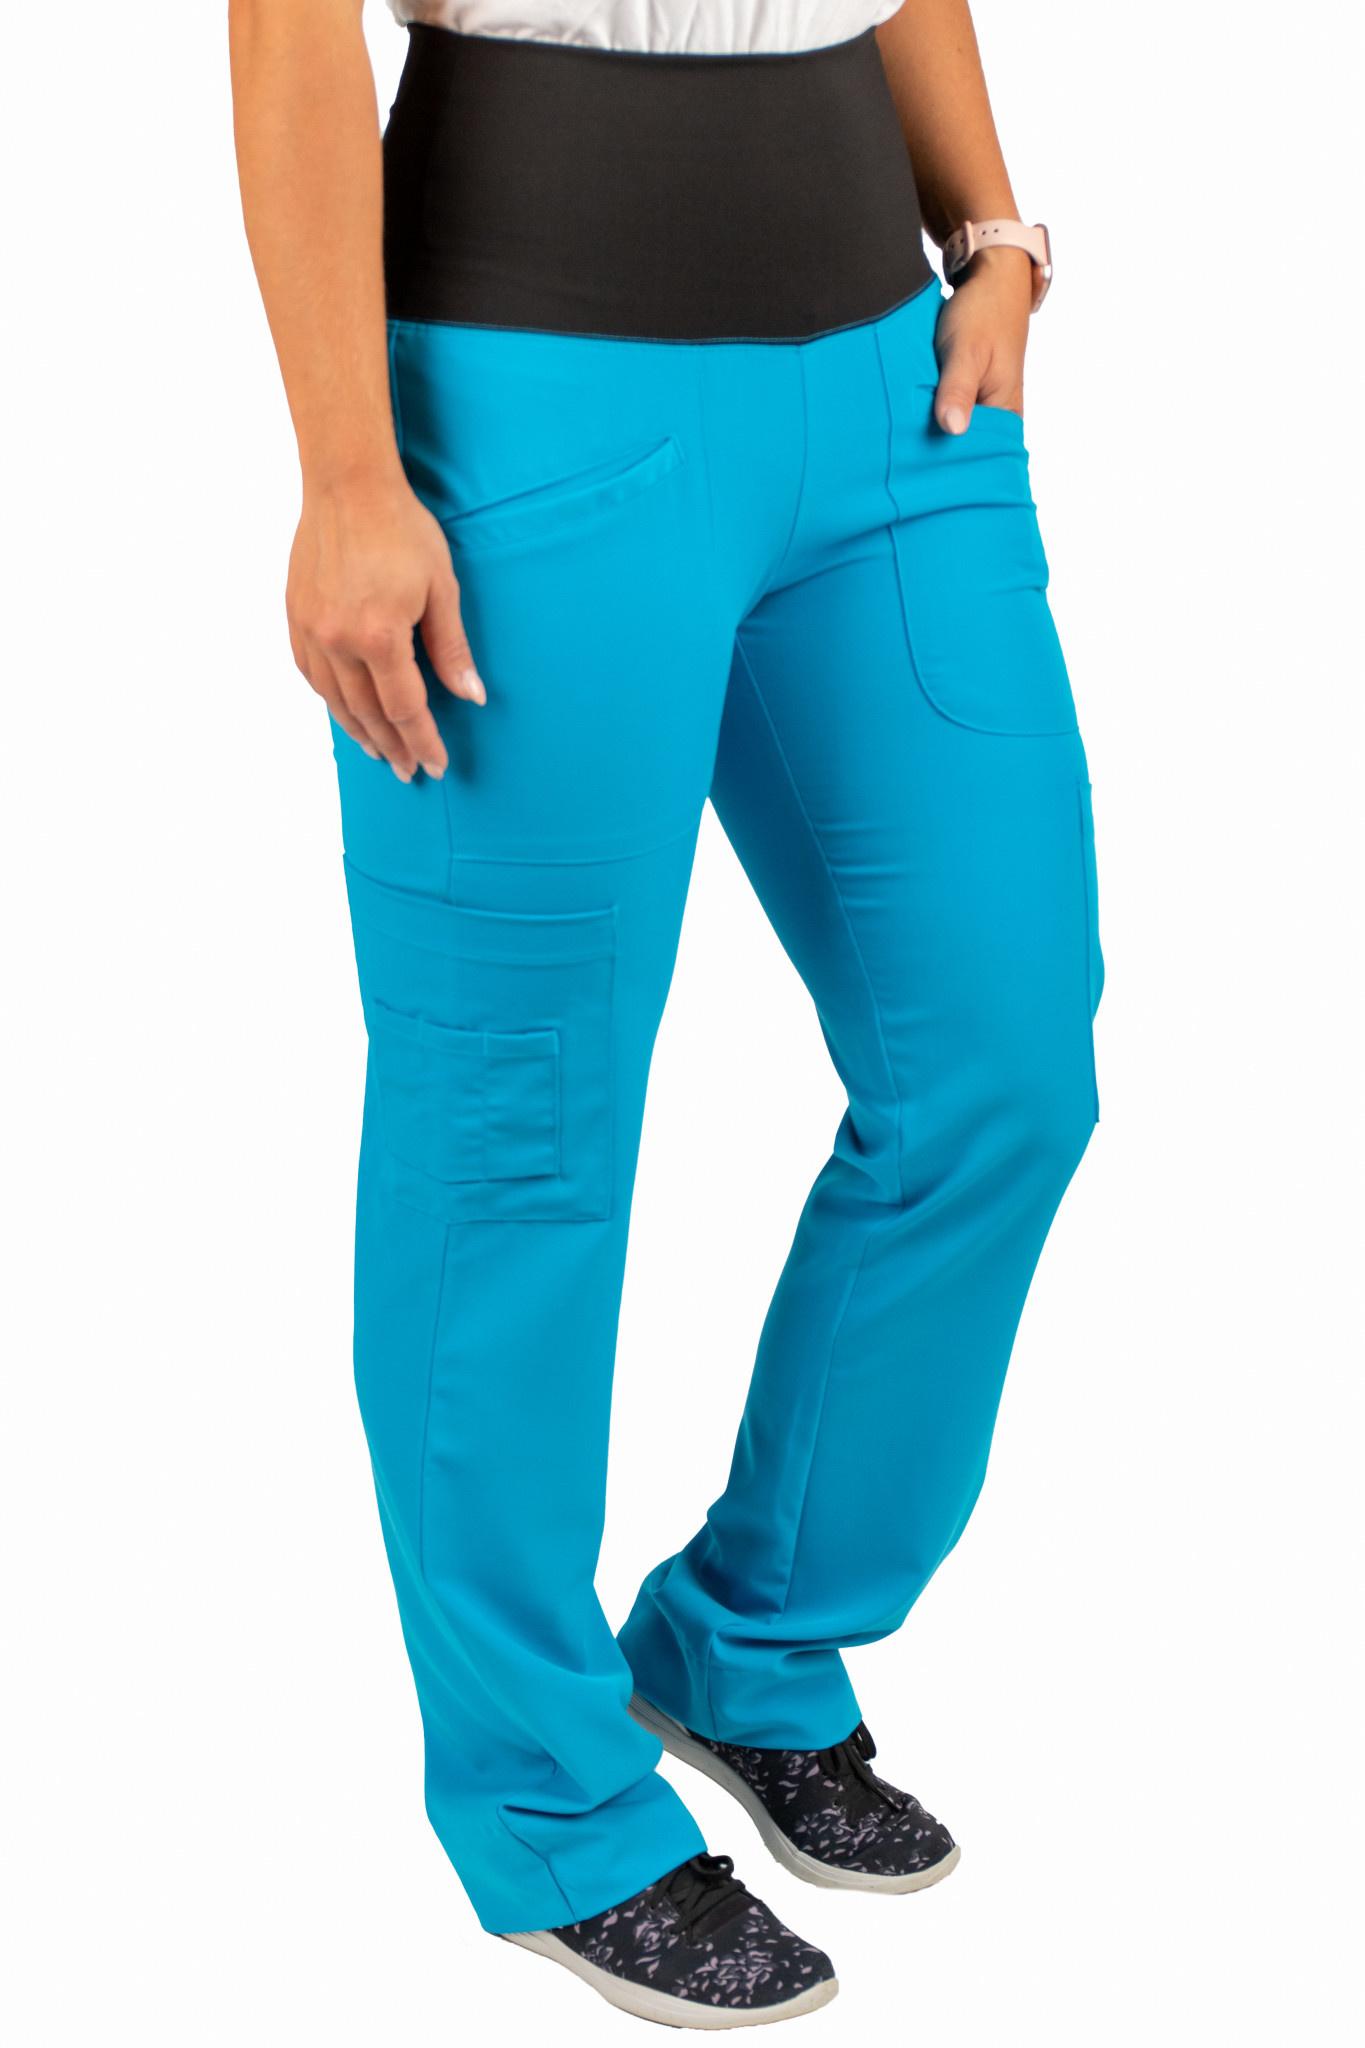 Jewel Blue Women's Yoga Waistband Pants 985